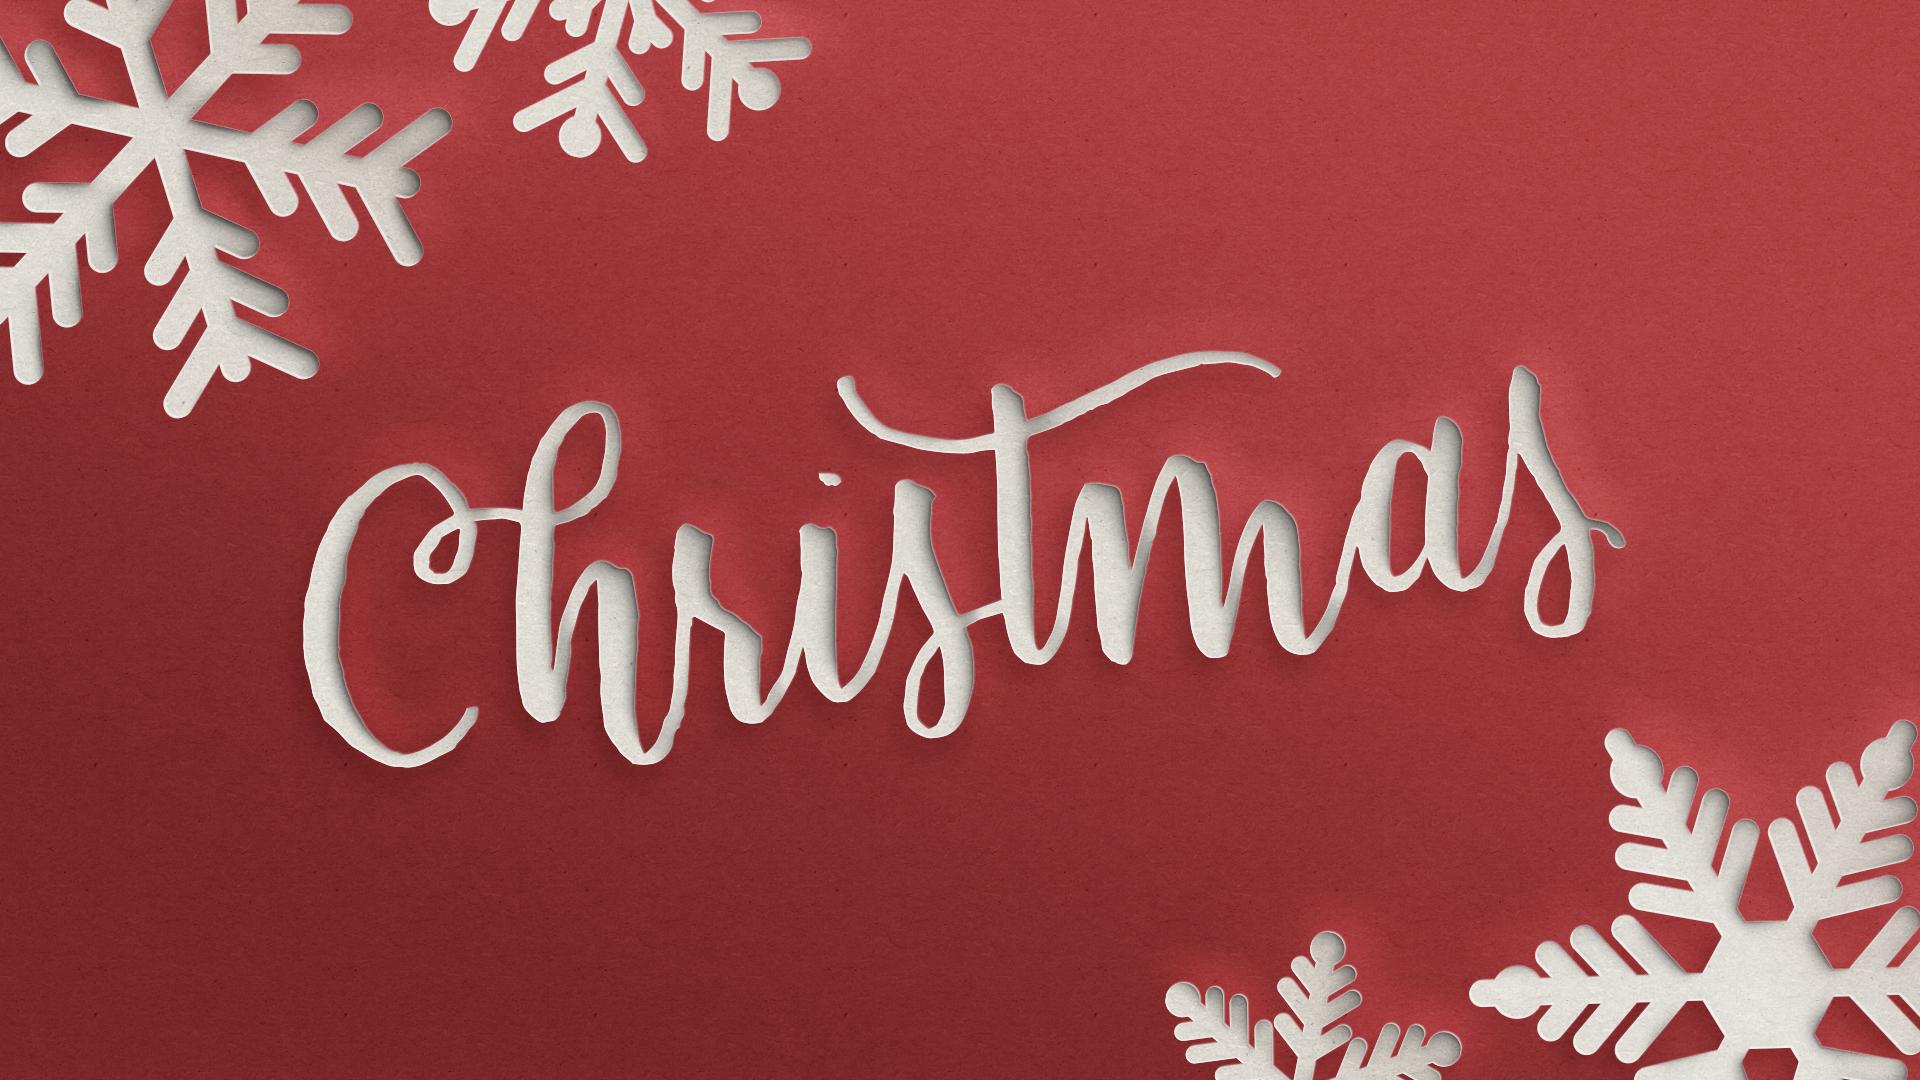 Christmas2017_WebHeader.jpg